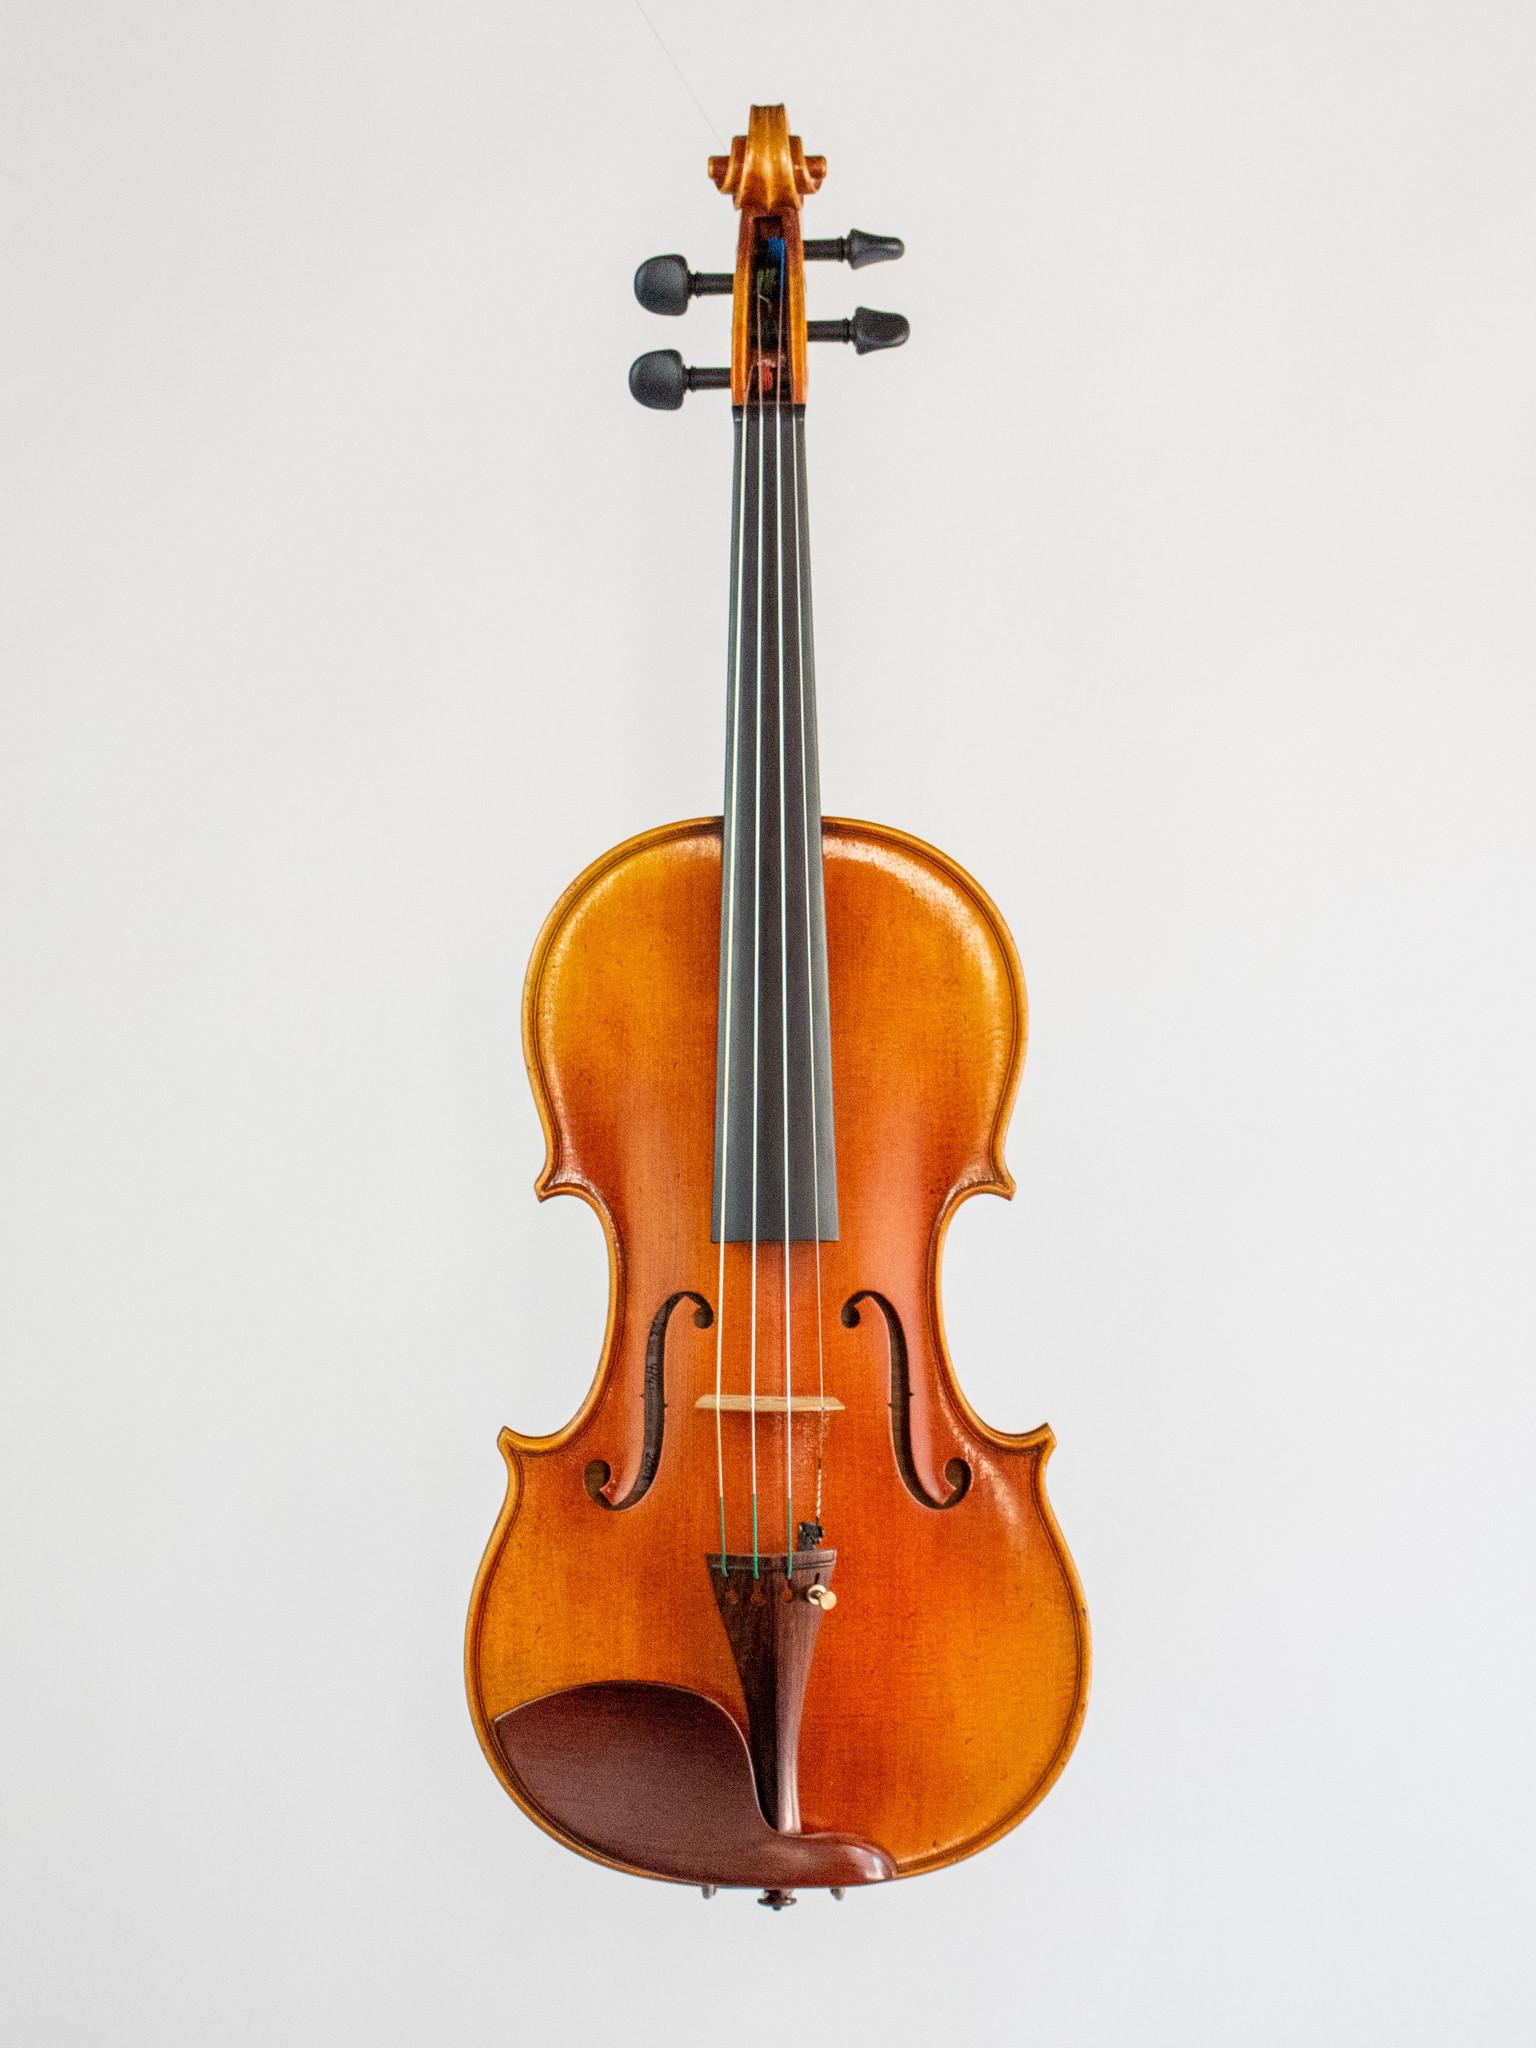 Heffler Klaus Heffler 4/4 violin, model 706, 2008, GERMANY